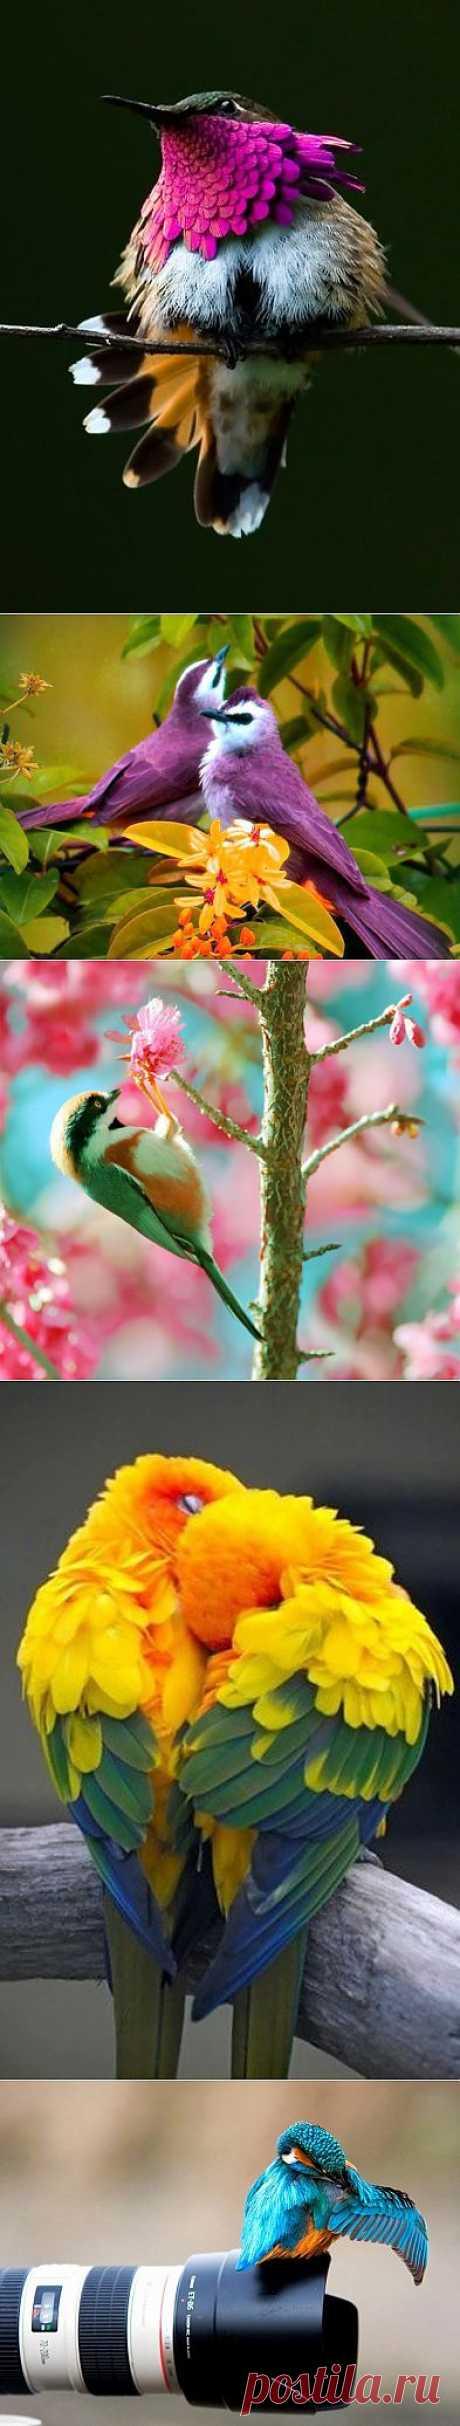 Фото подборочка ярких птичек.